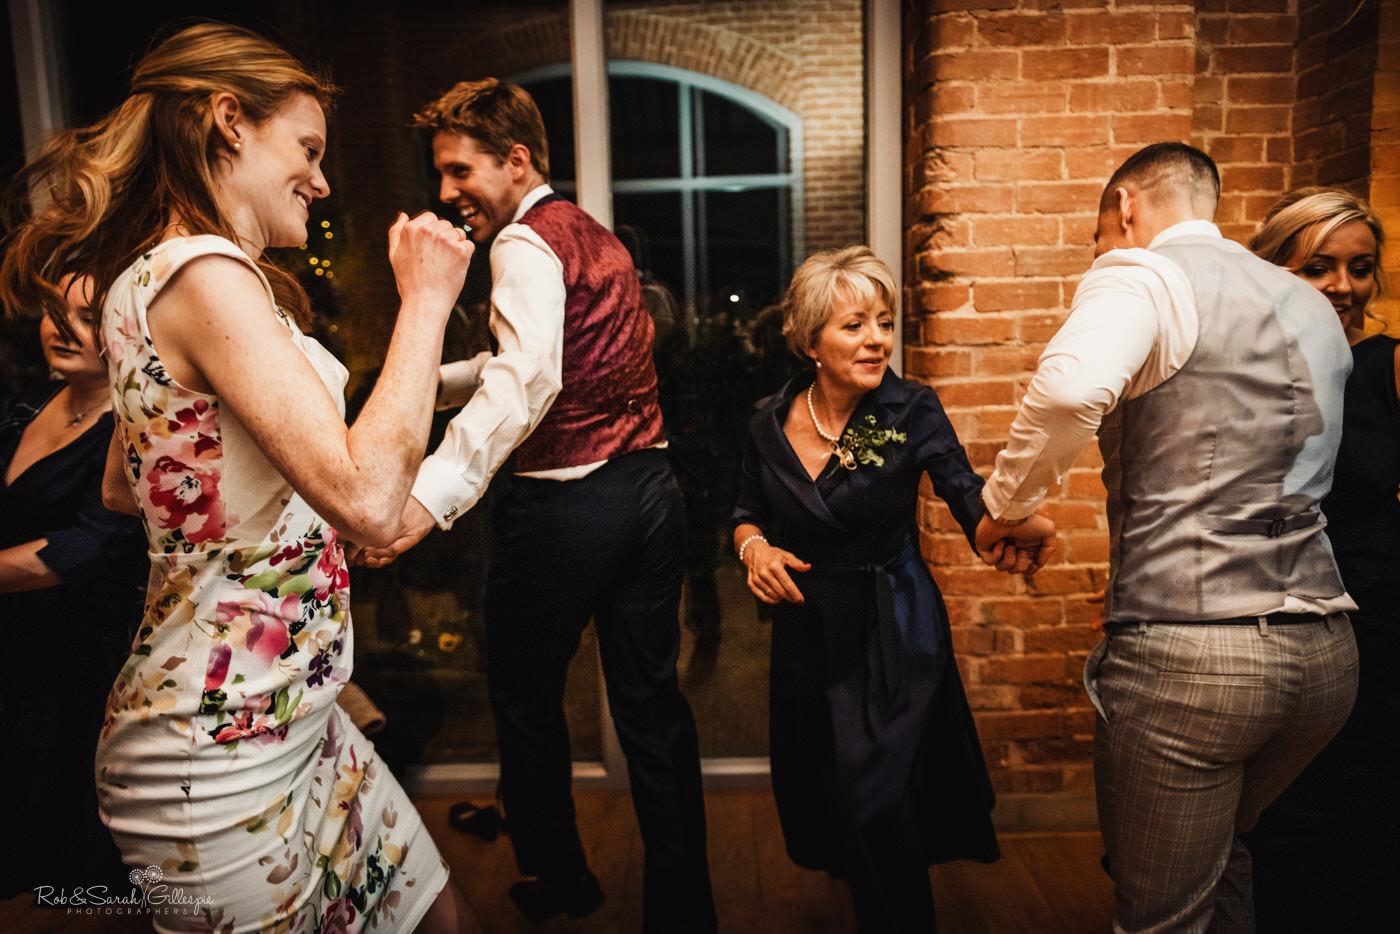 Swallows Nest Barn ceilidh dancing